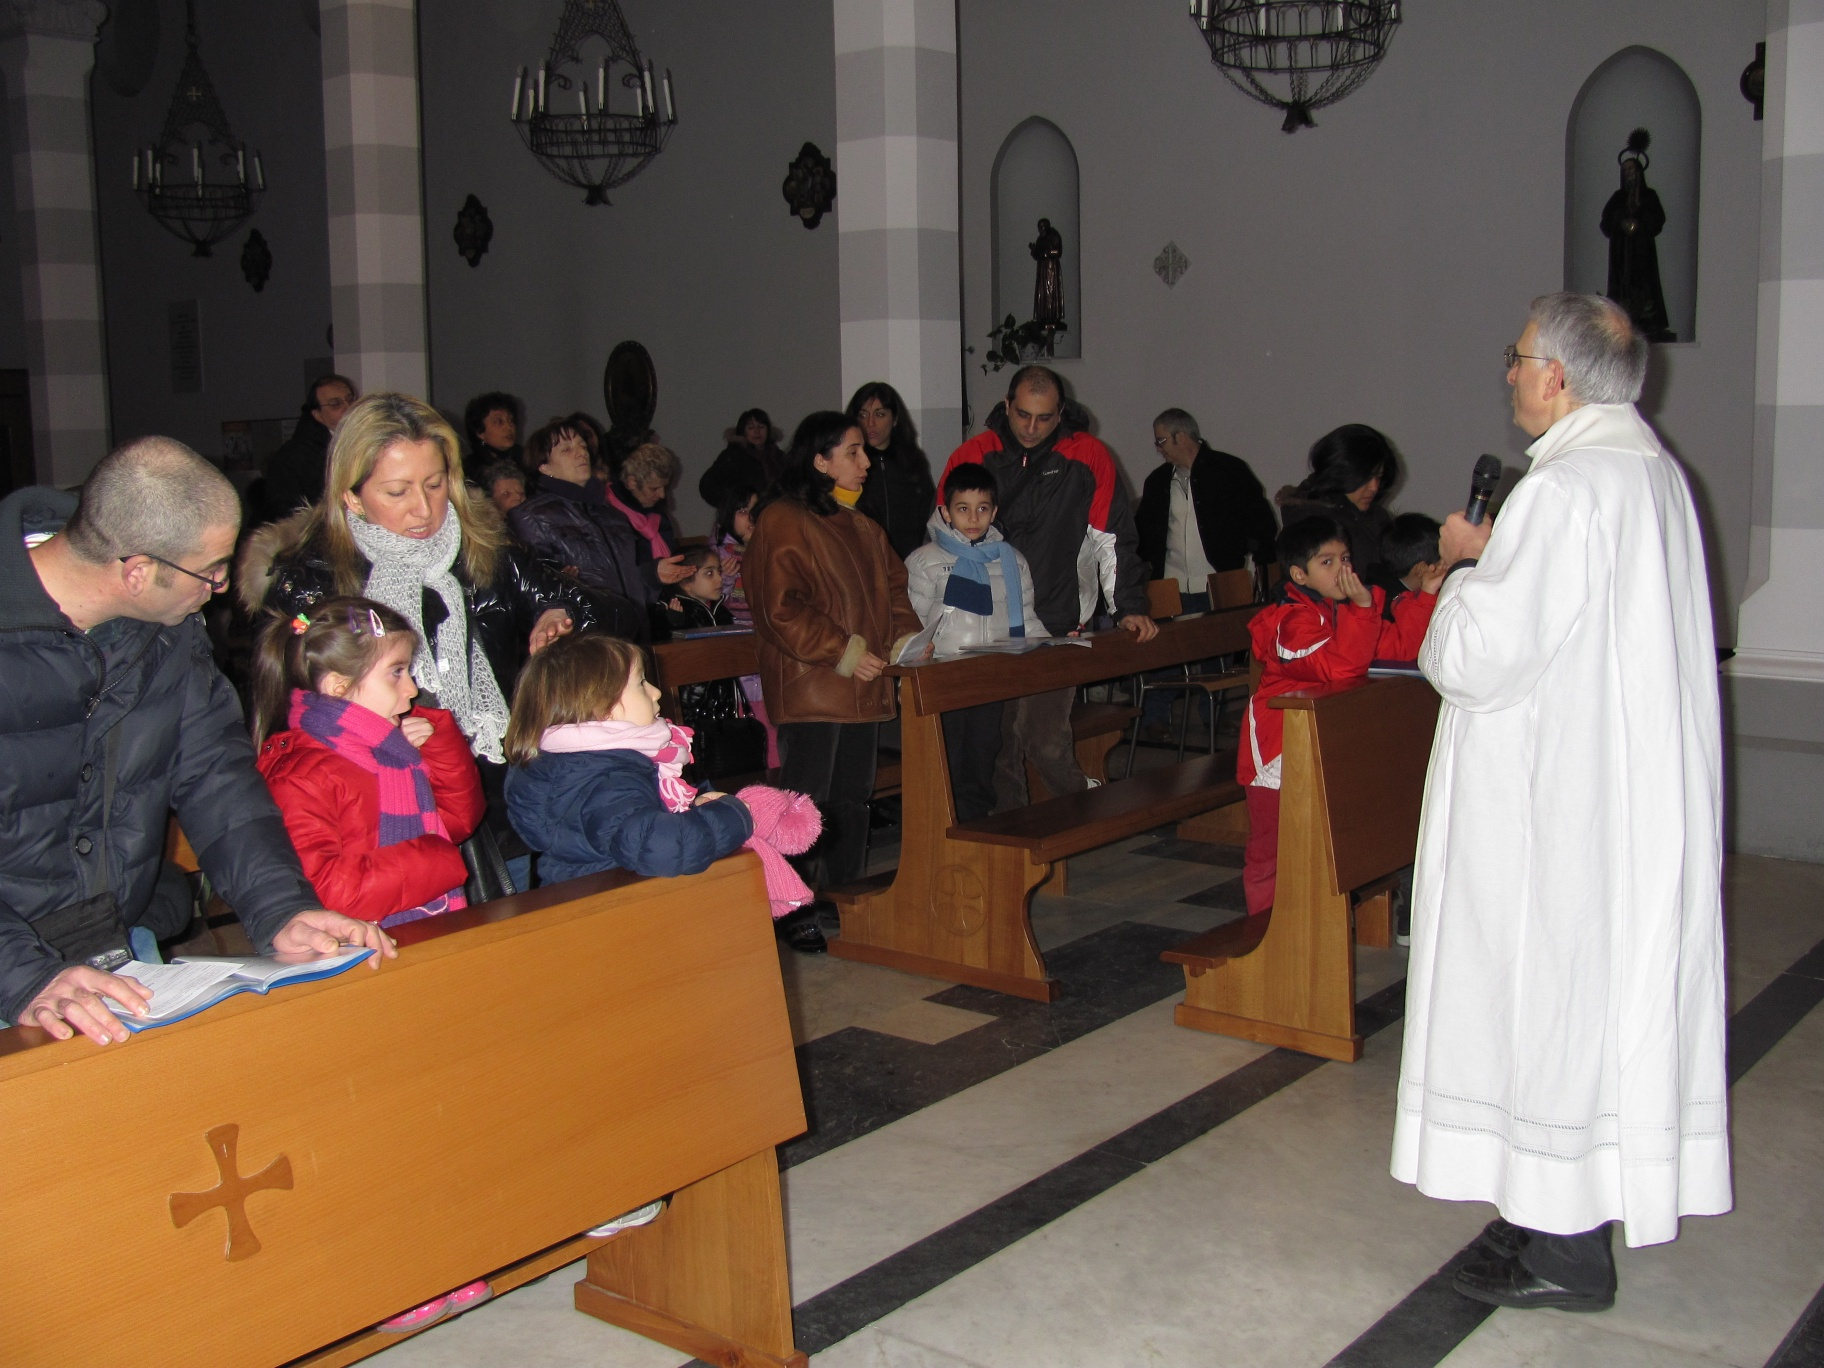 ricordo_battesimo_gesu_2011-01-23-16-31-03